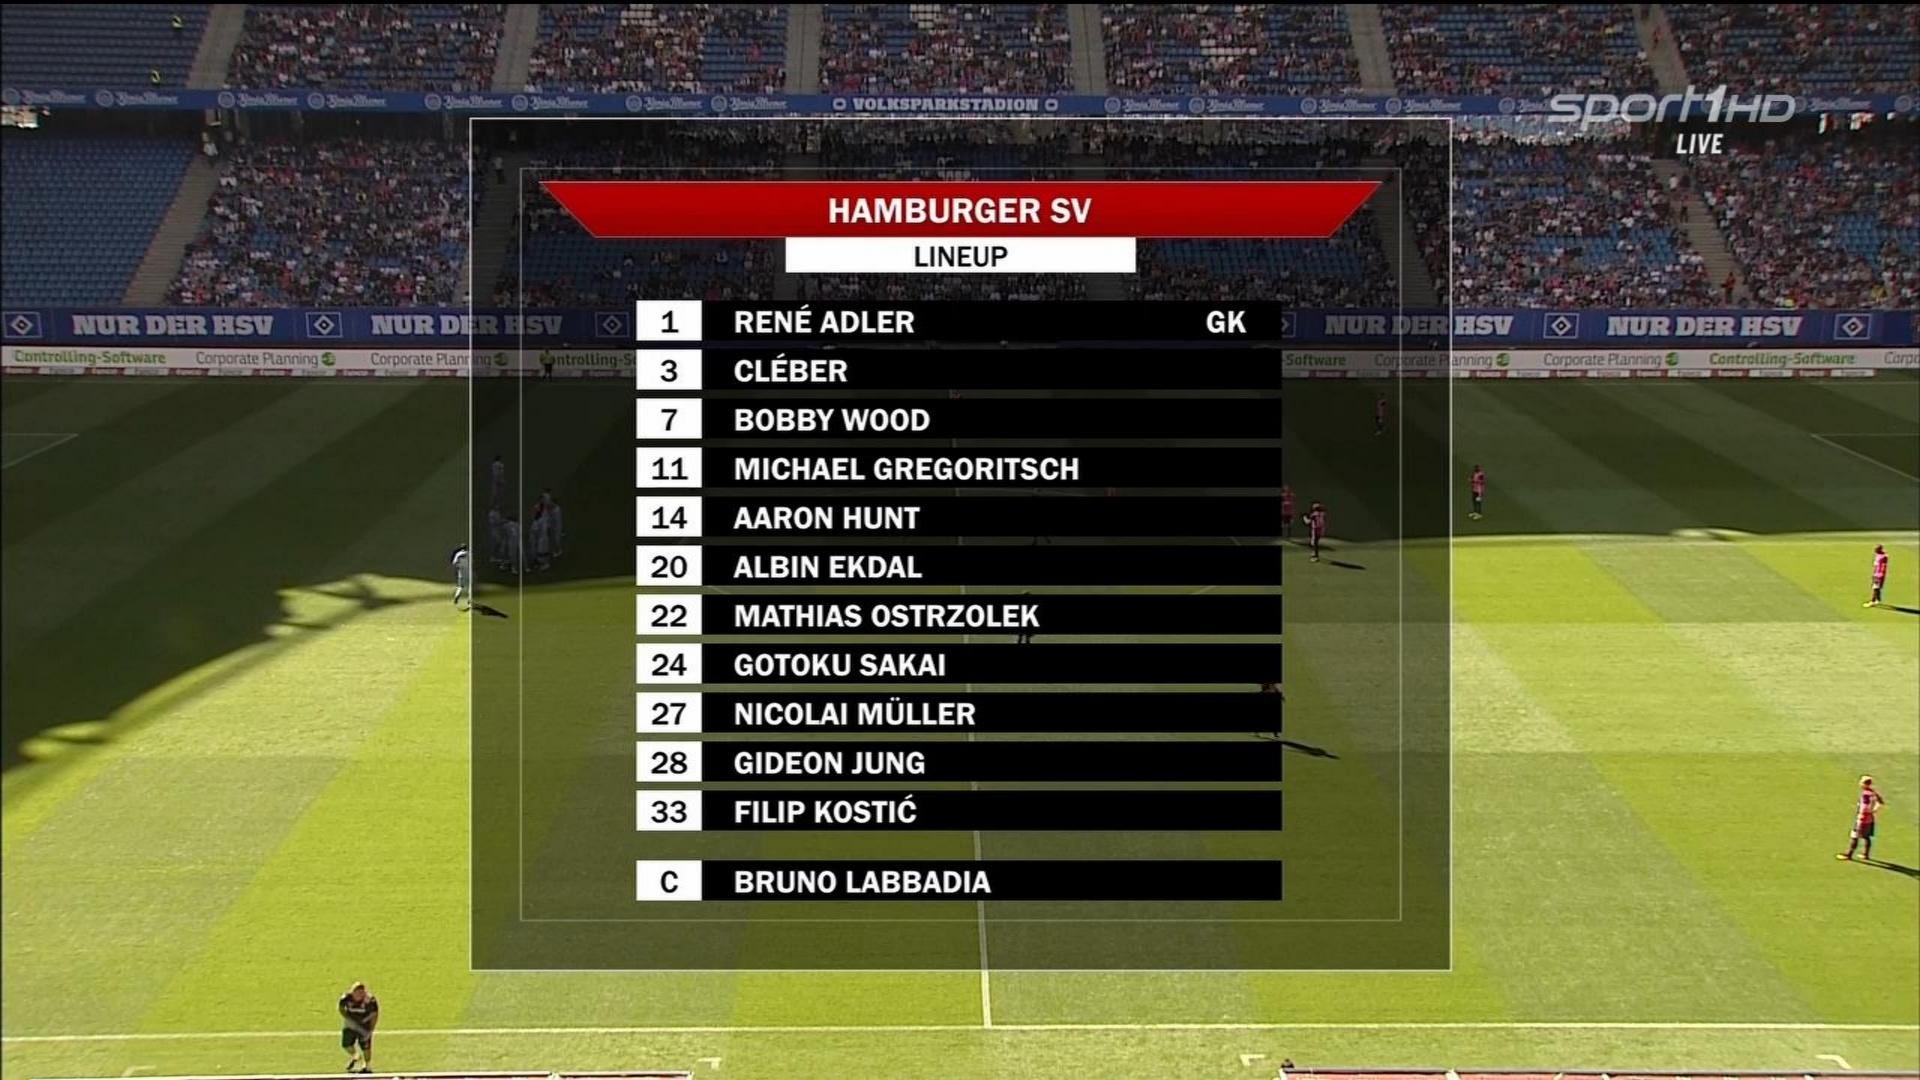 FUTBOL: Club Friendly - Hamburger SV vs Stoke City - 06/08/2016